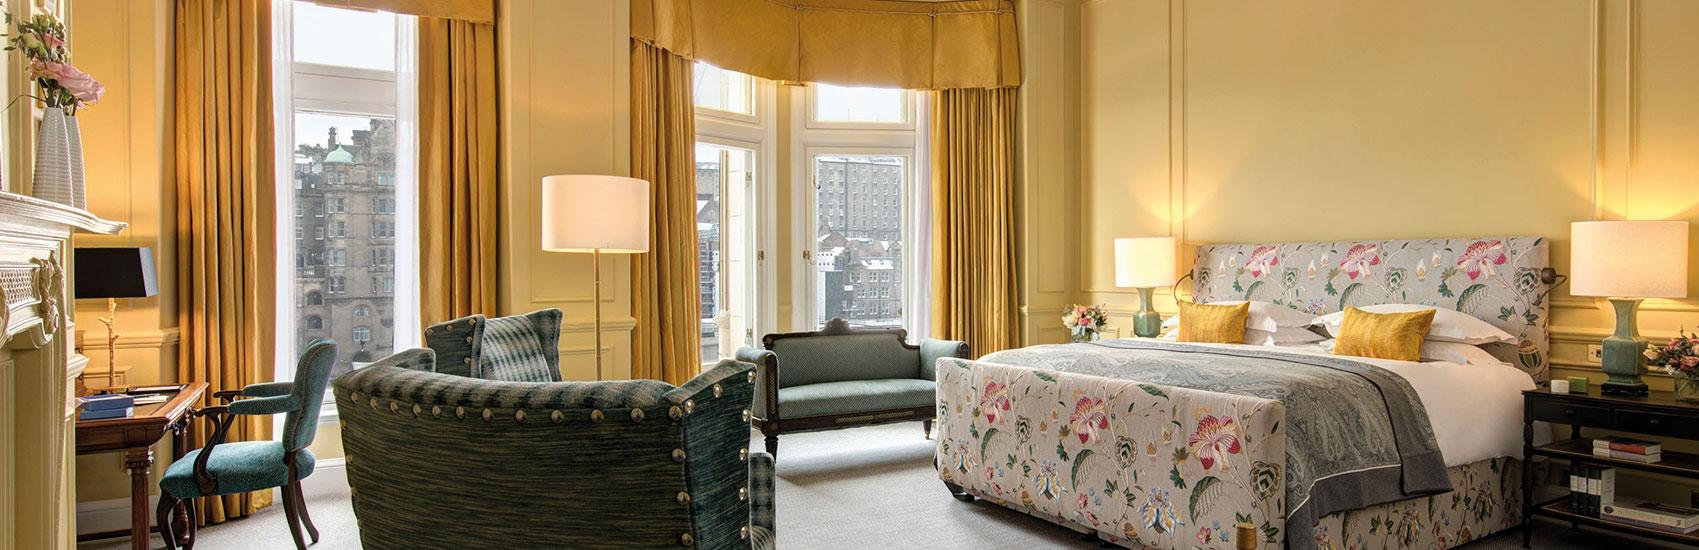 The Balmoral - a Rocco Forte hotel 2